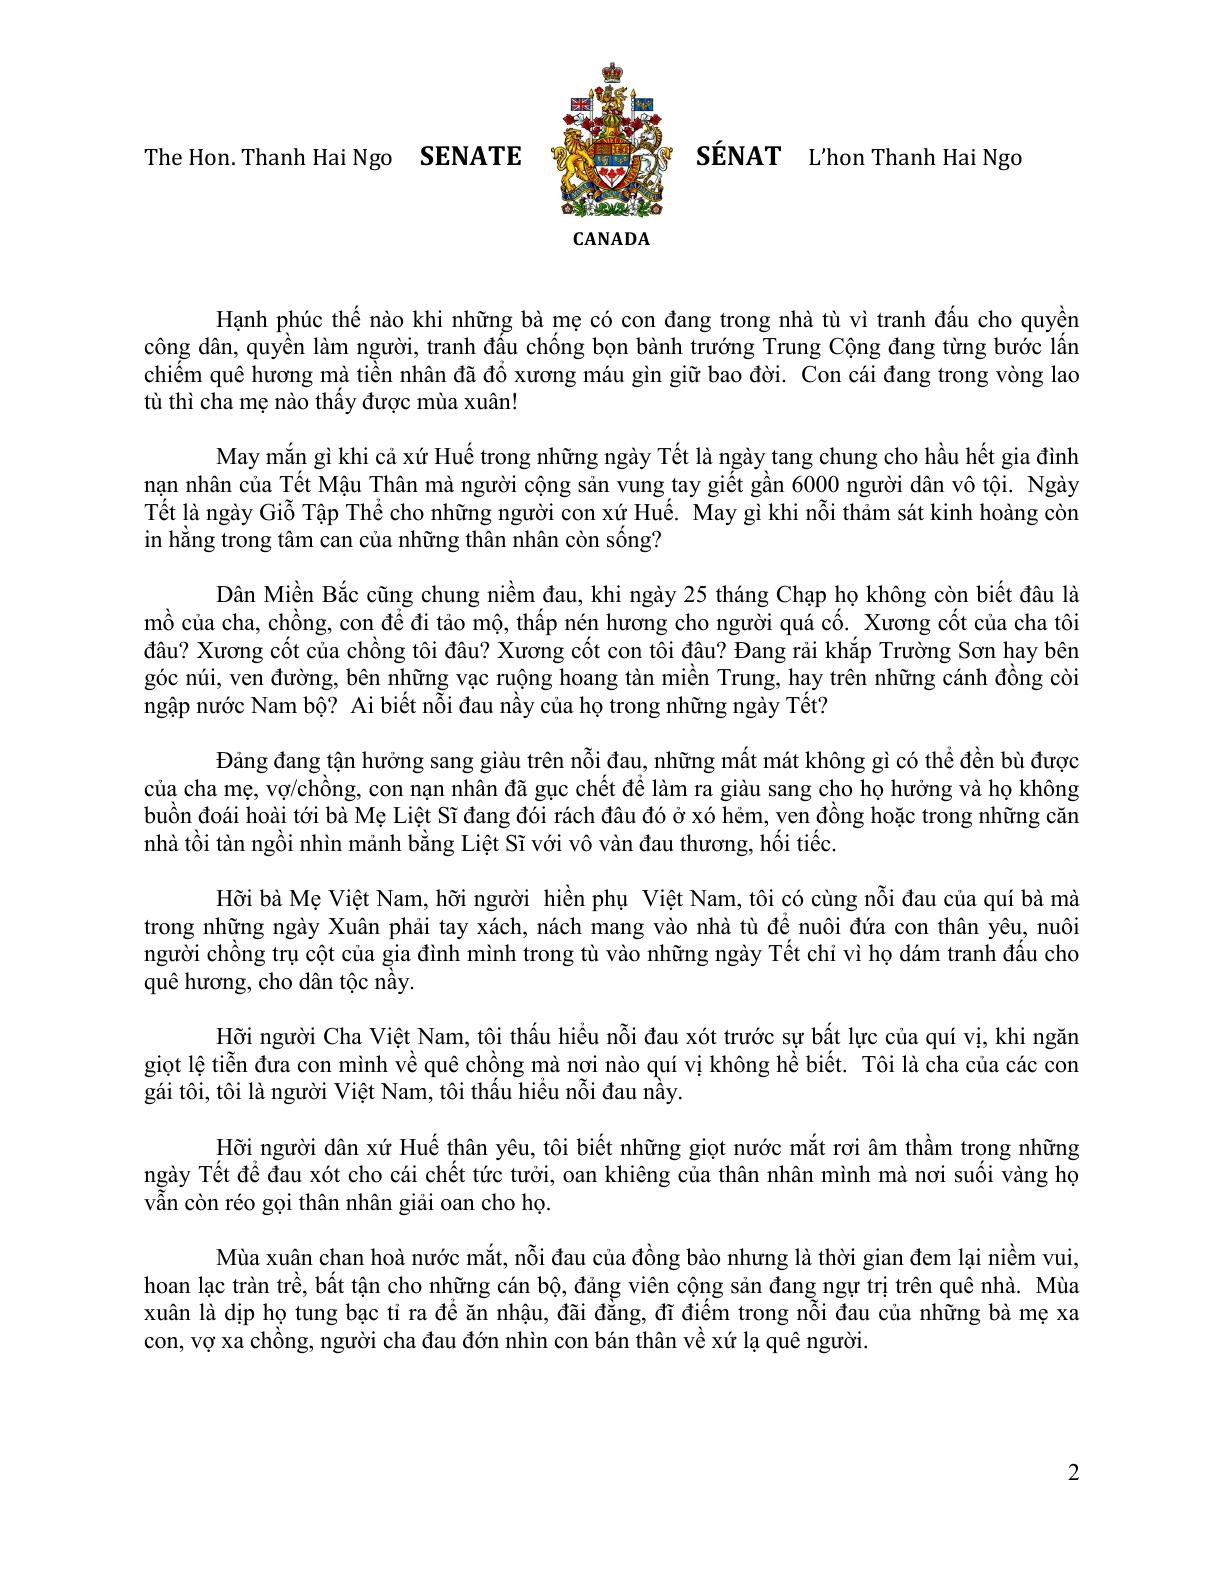 Message-from-Senator-Ngo-Tho-Chuc-Tet2